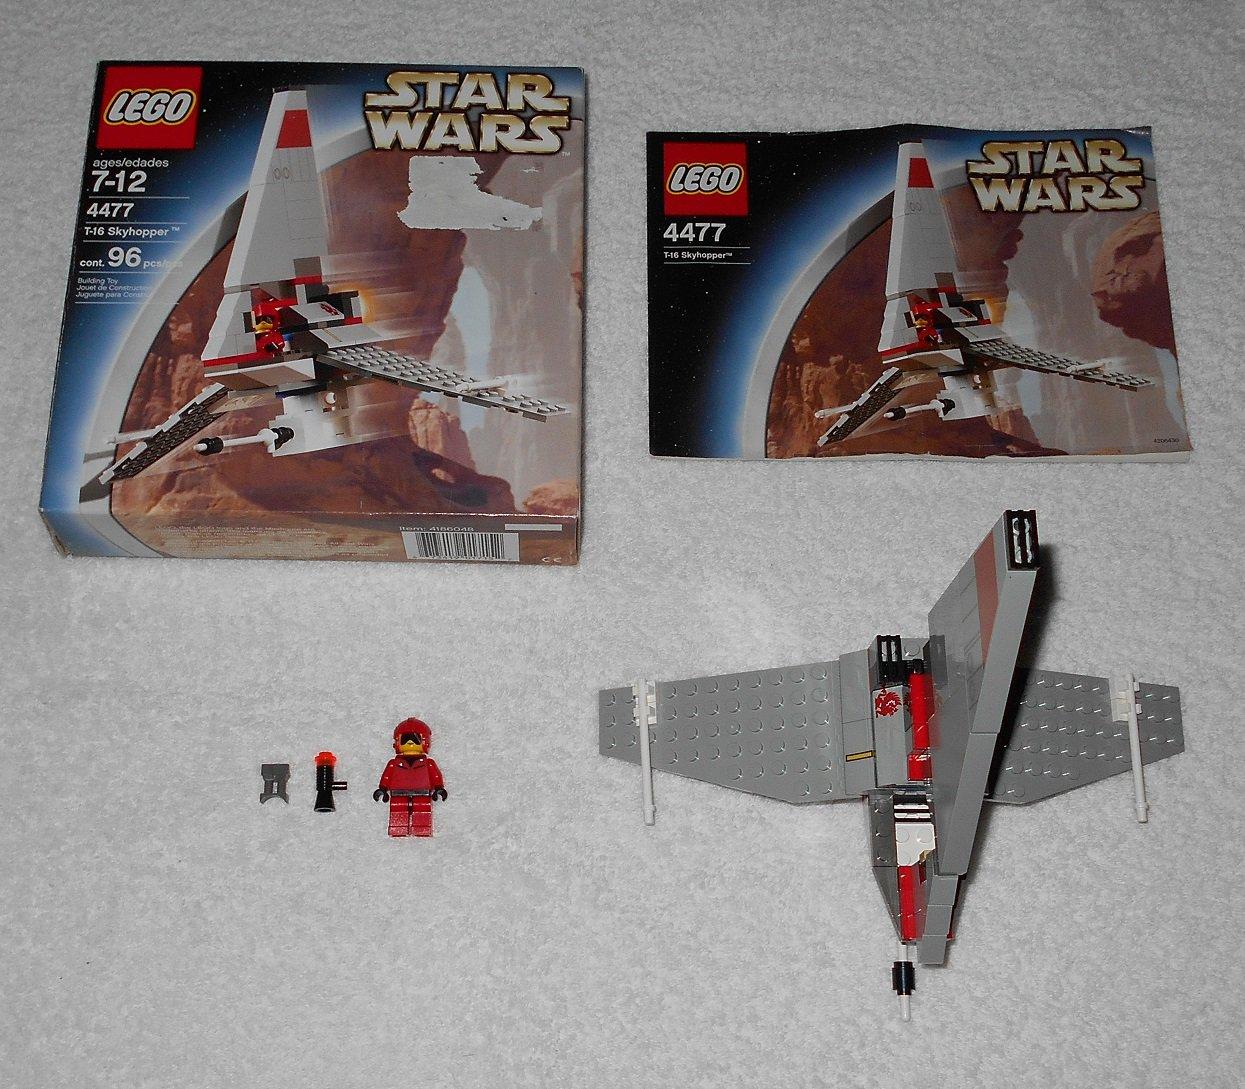 LEGO 4477 - T-16 Skyhopper - Star Wars - 2003 - Complete Set w/ Instructions & Box